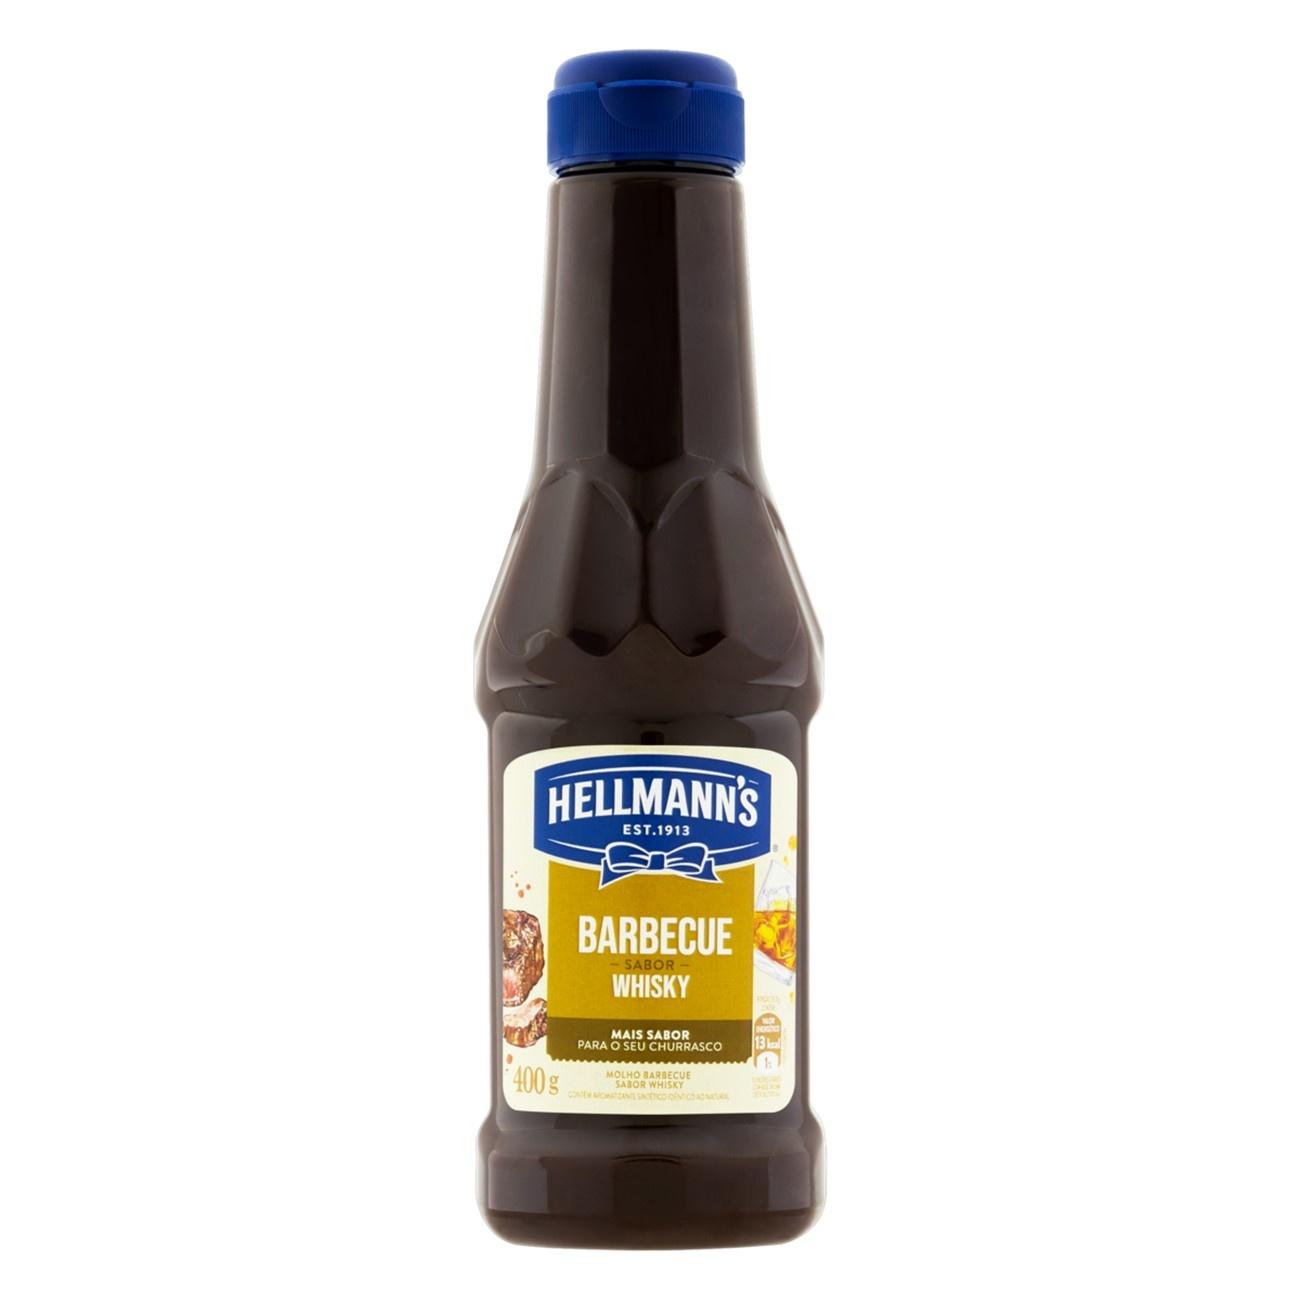 HELLMANNS MOLHO BARBE WHISKY 1X400G (12